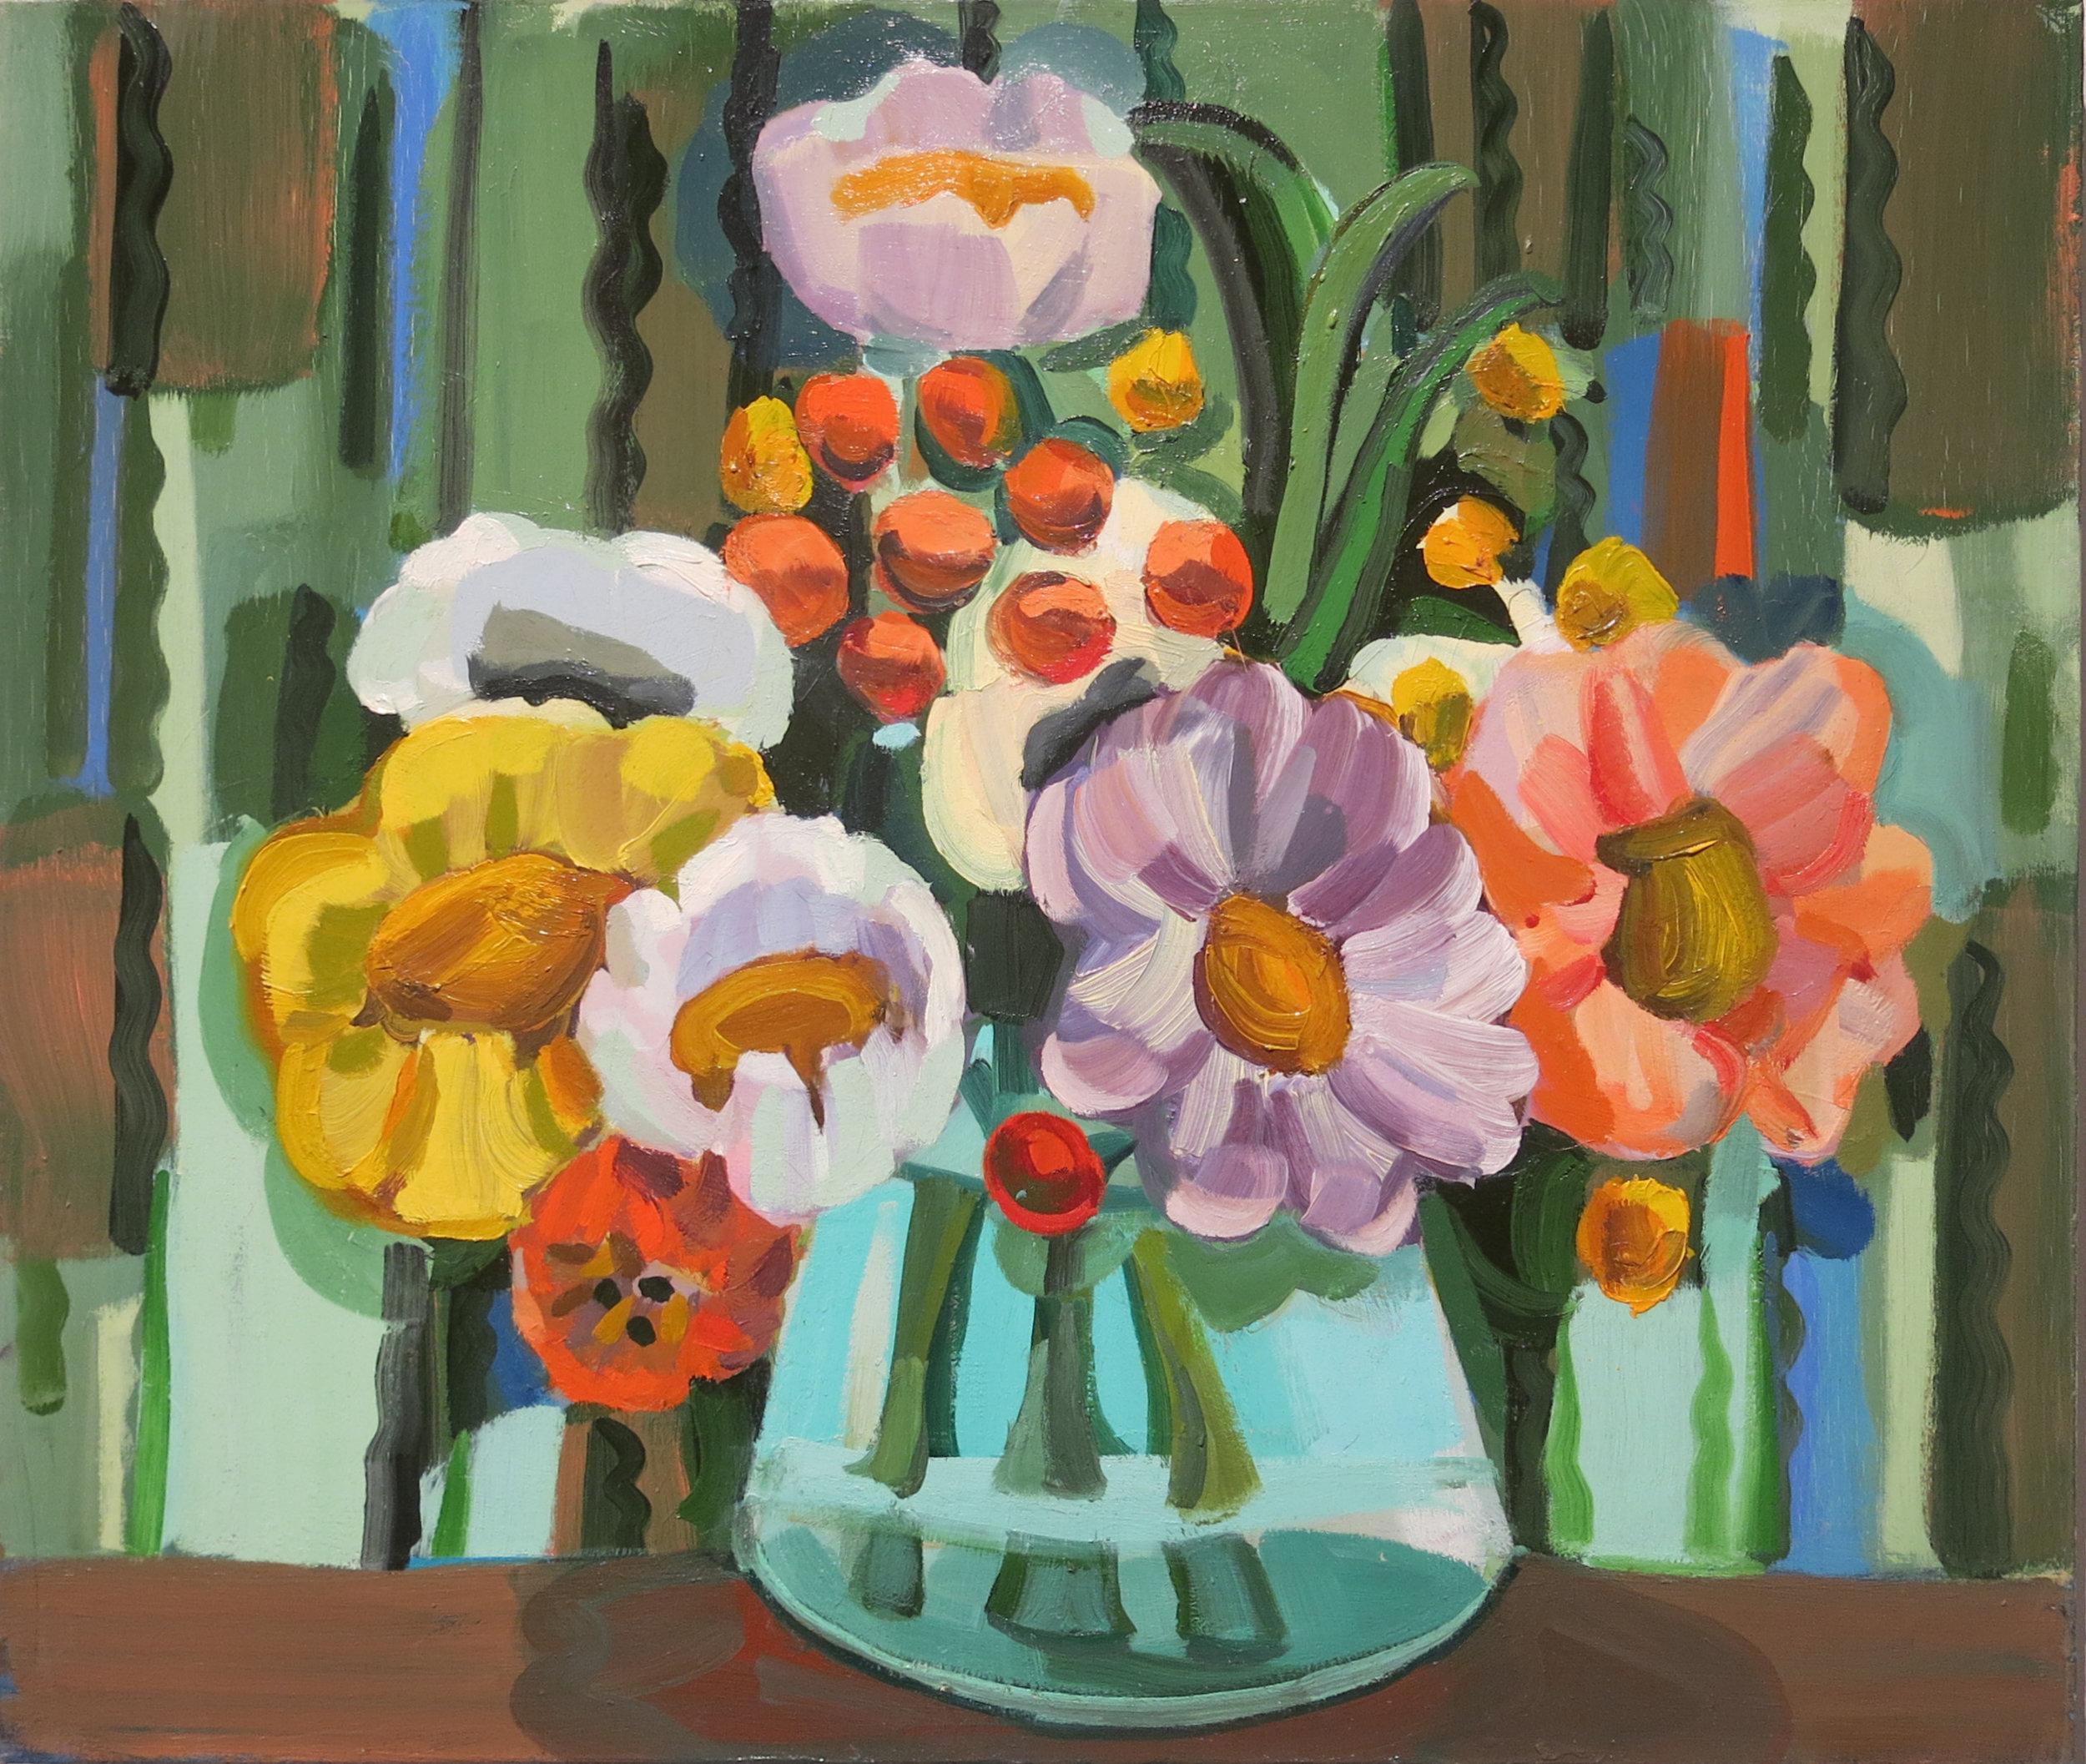 Judith Linhares, Peonies, 2009, oil on linen, 22h x 26w in.